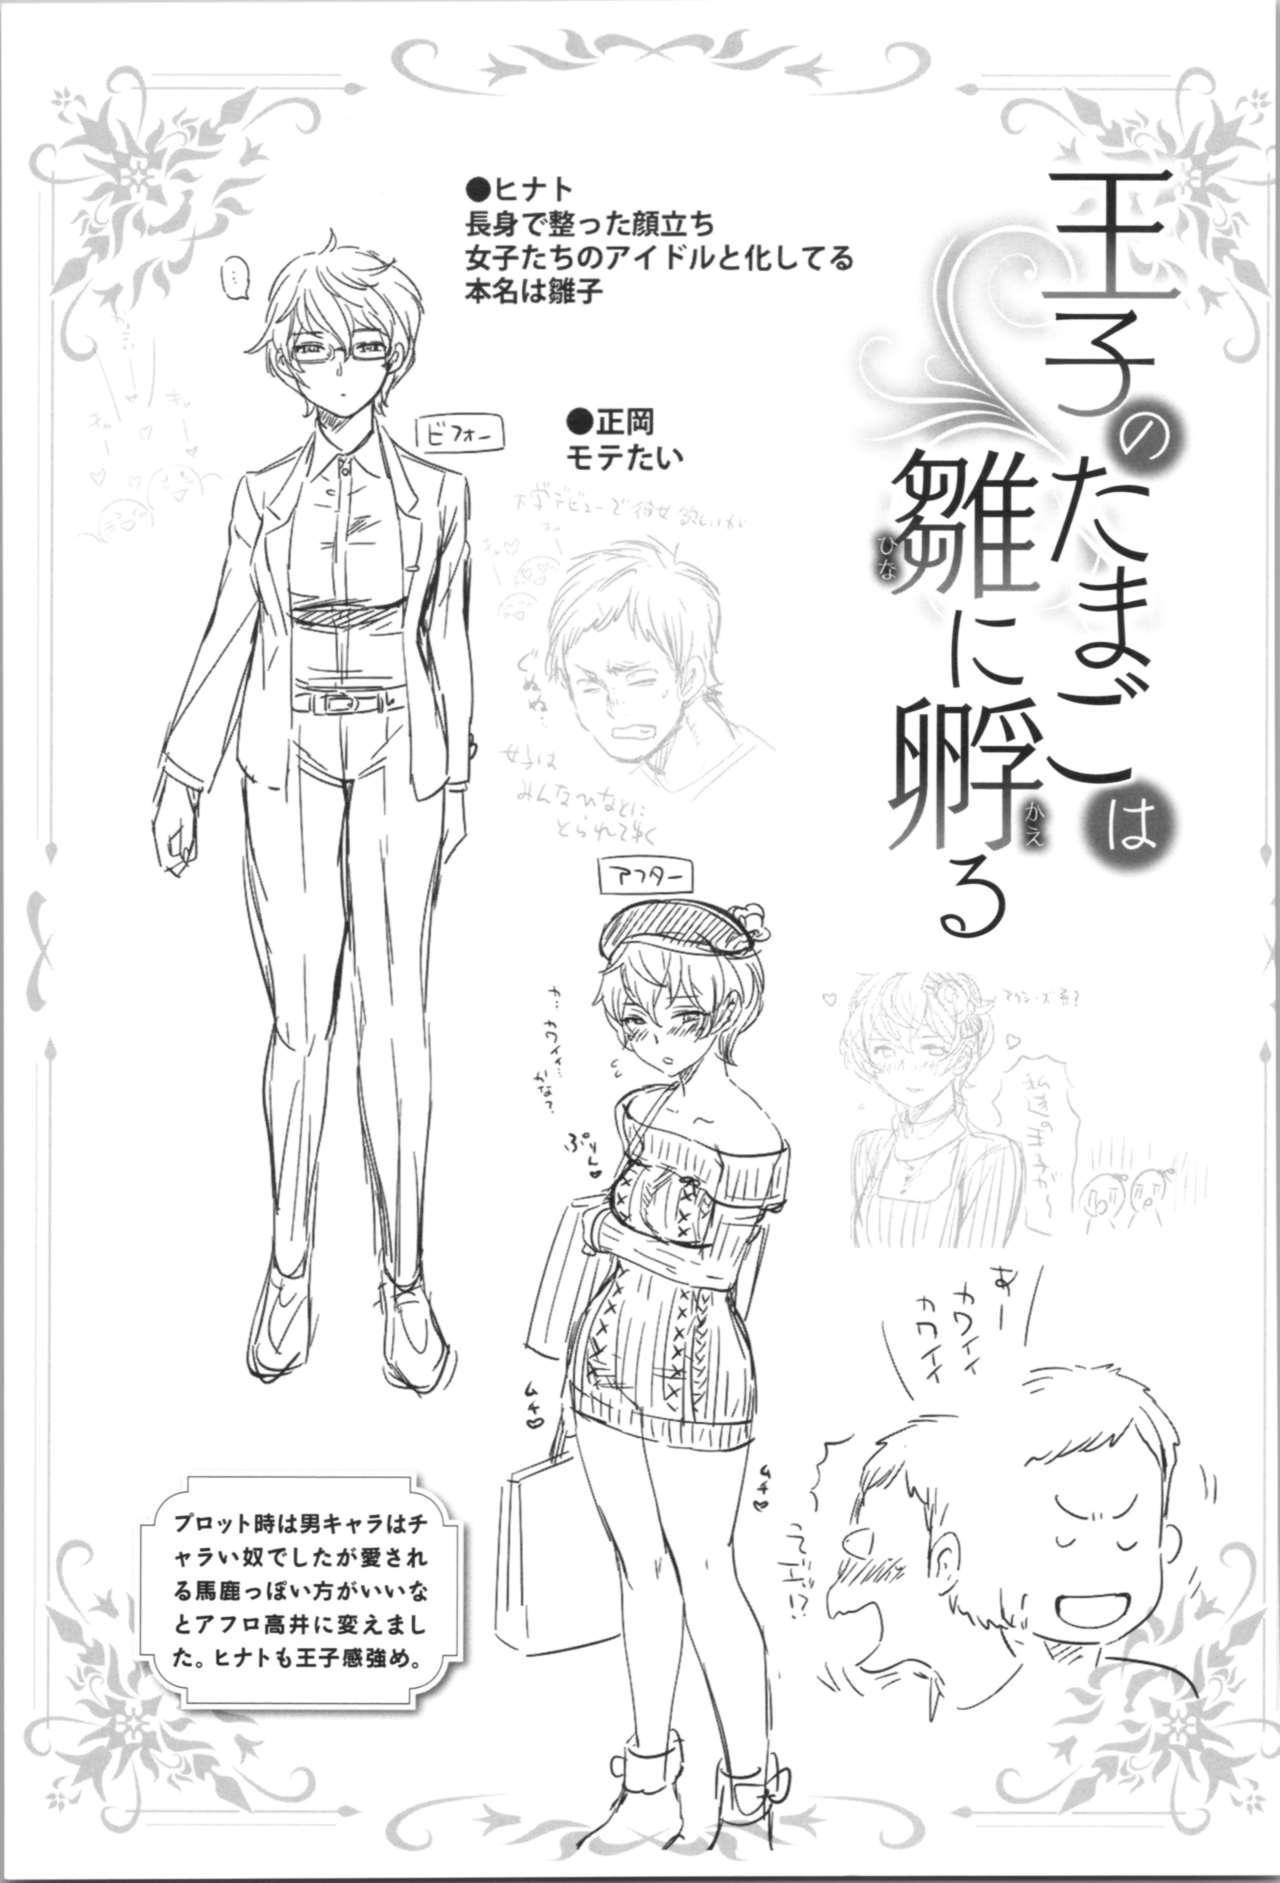 Ouji no Tamago wa Hina ni Kaeru | The Prince's Egg is Hatching 17